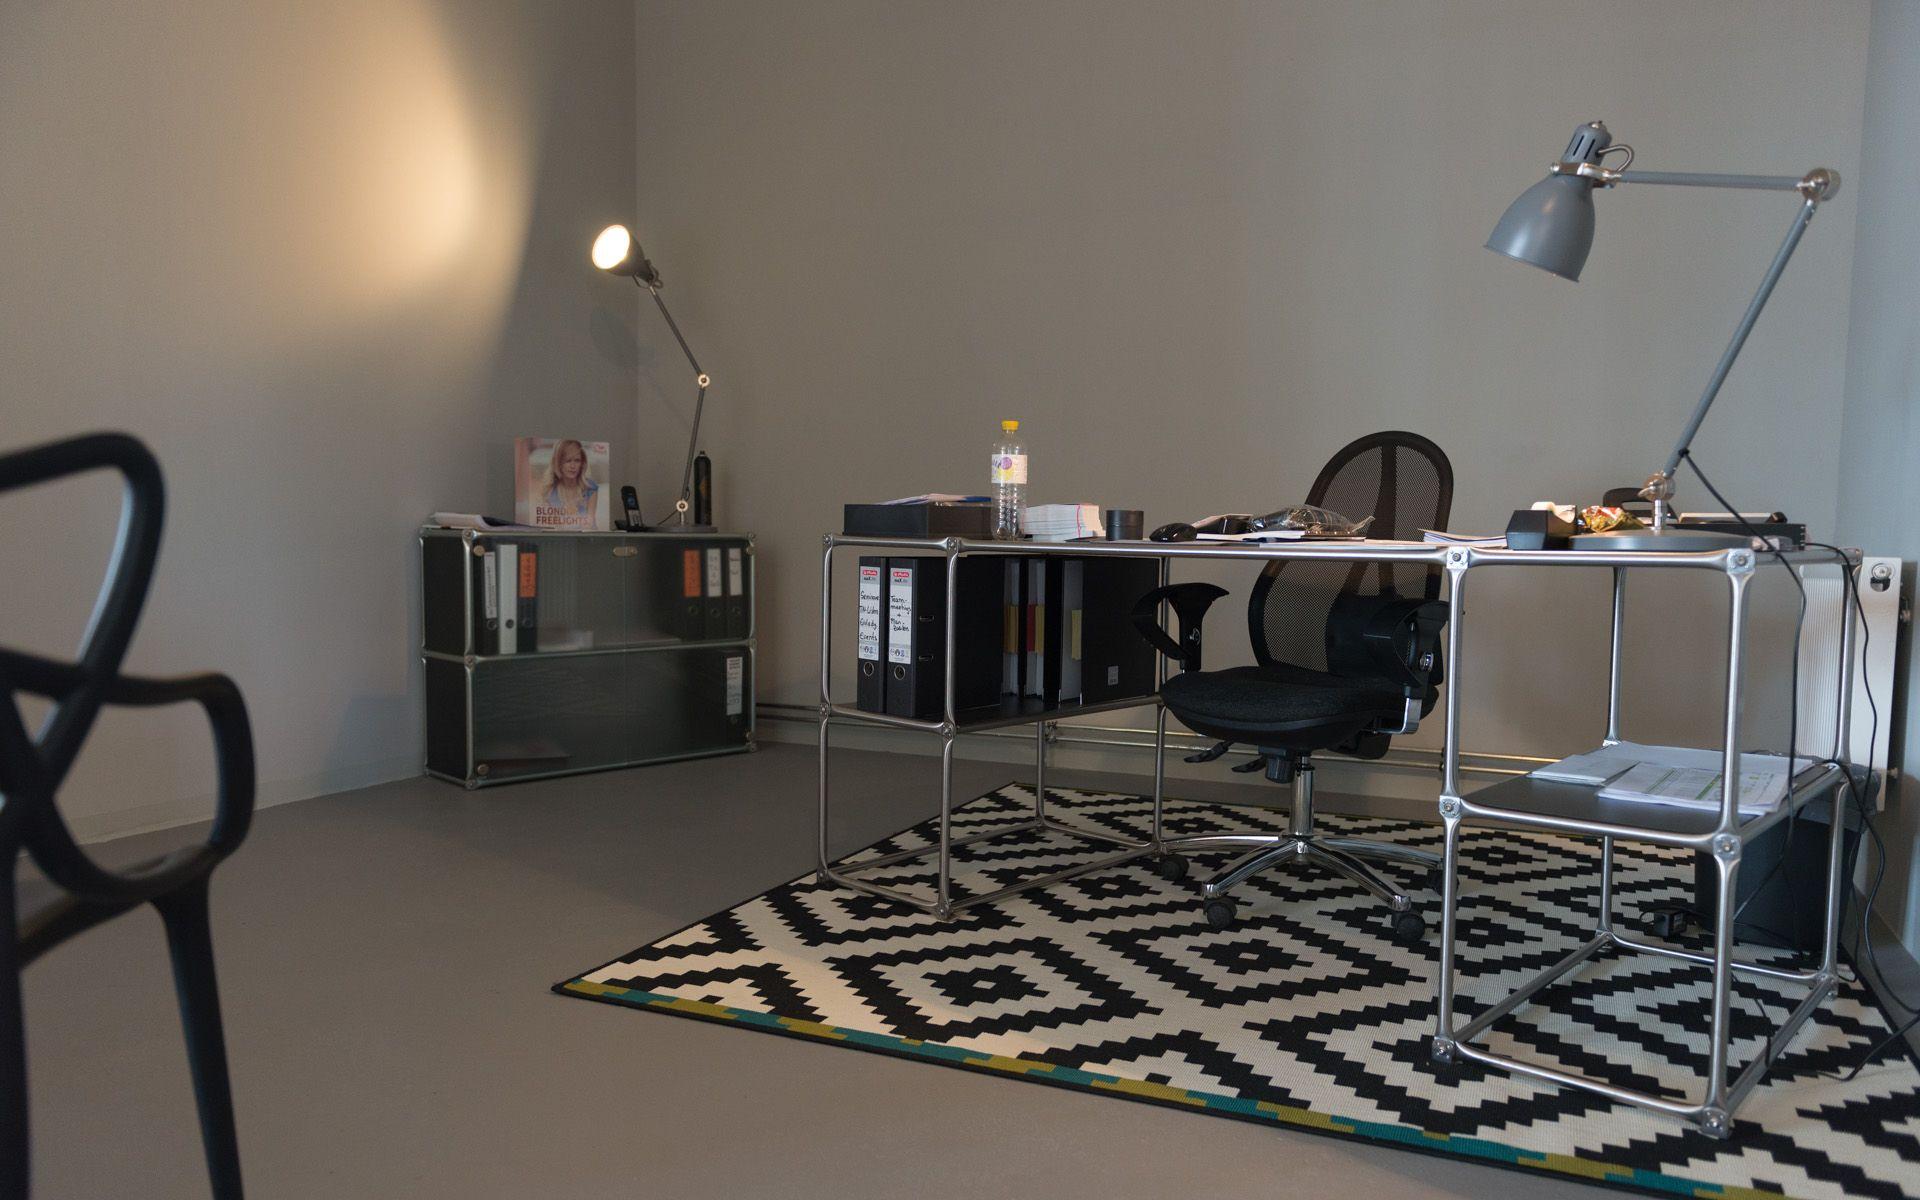 b ro interieur design i open space einrichtung i projekt. Black Bedroom Furniture Sets. Home Design Ideas